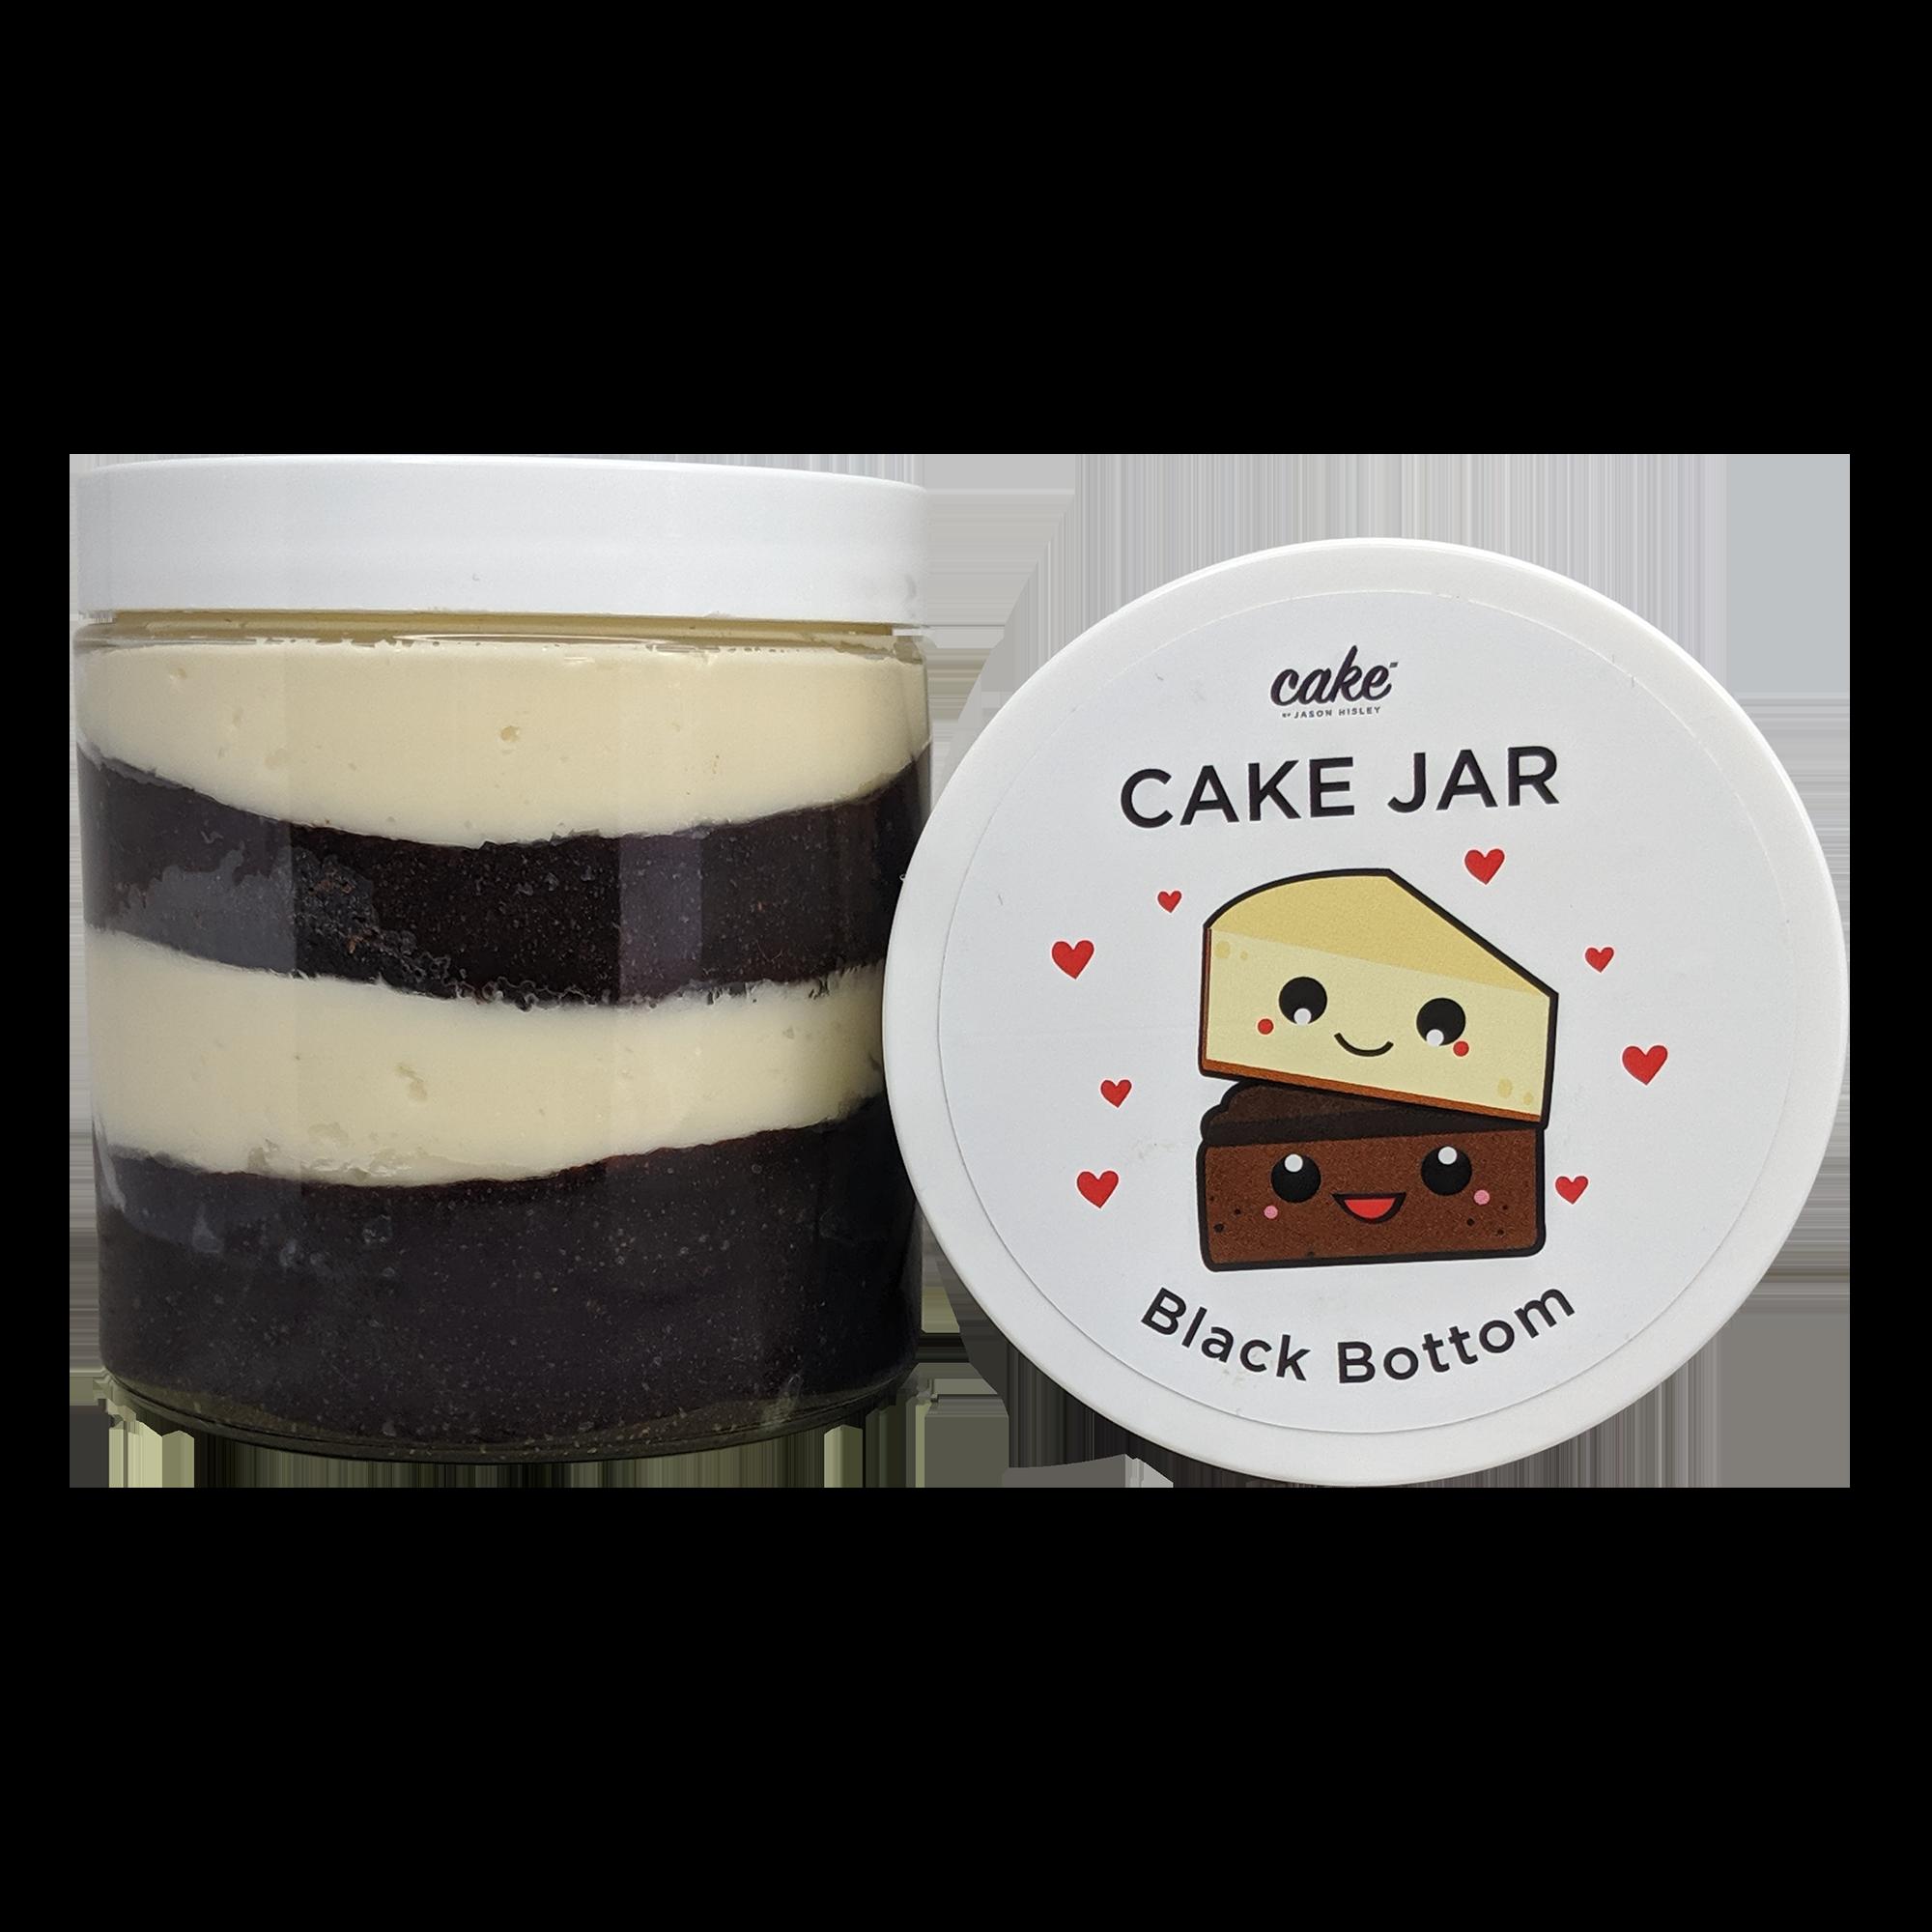 Black Bottom Cake Jar